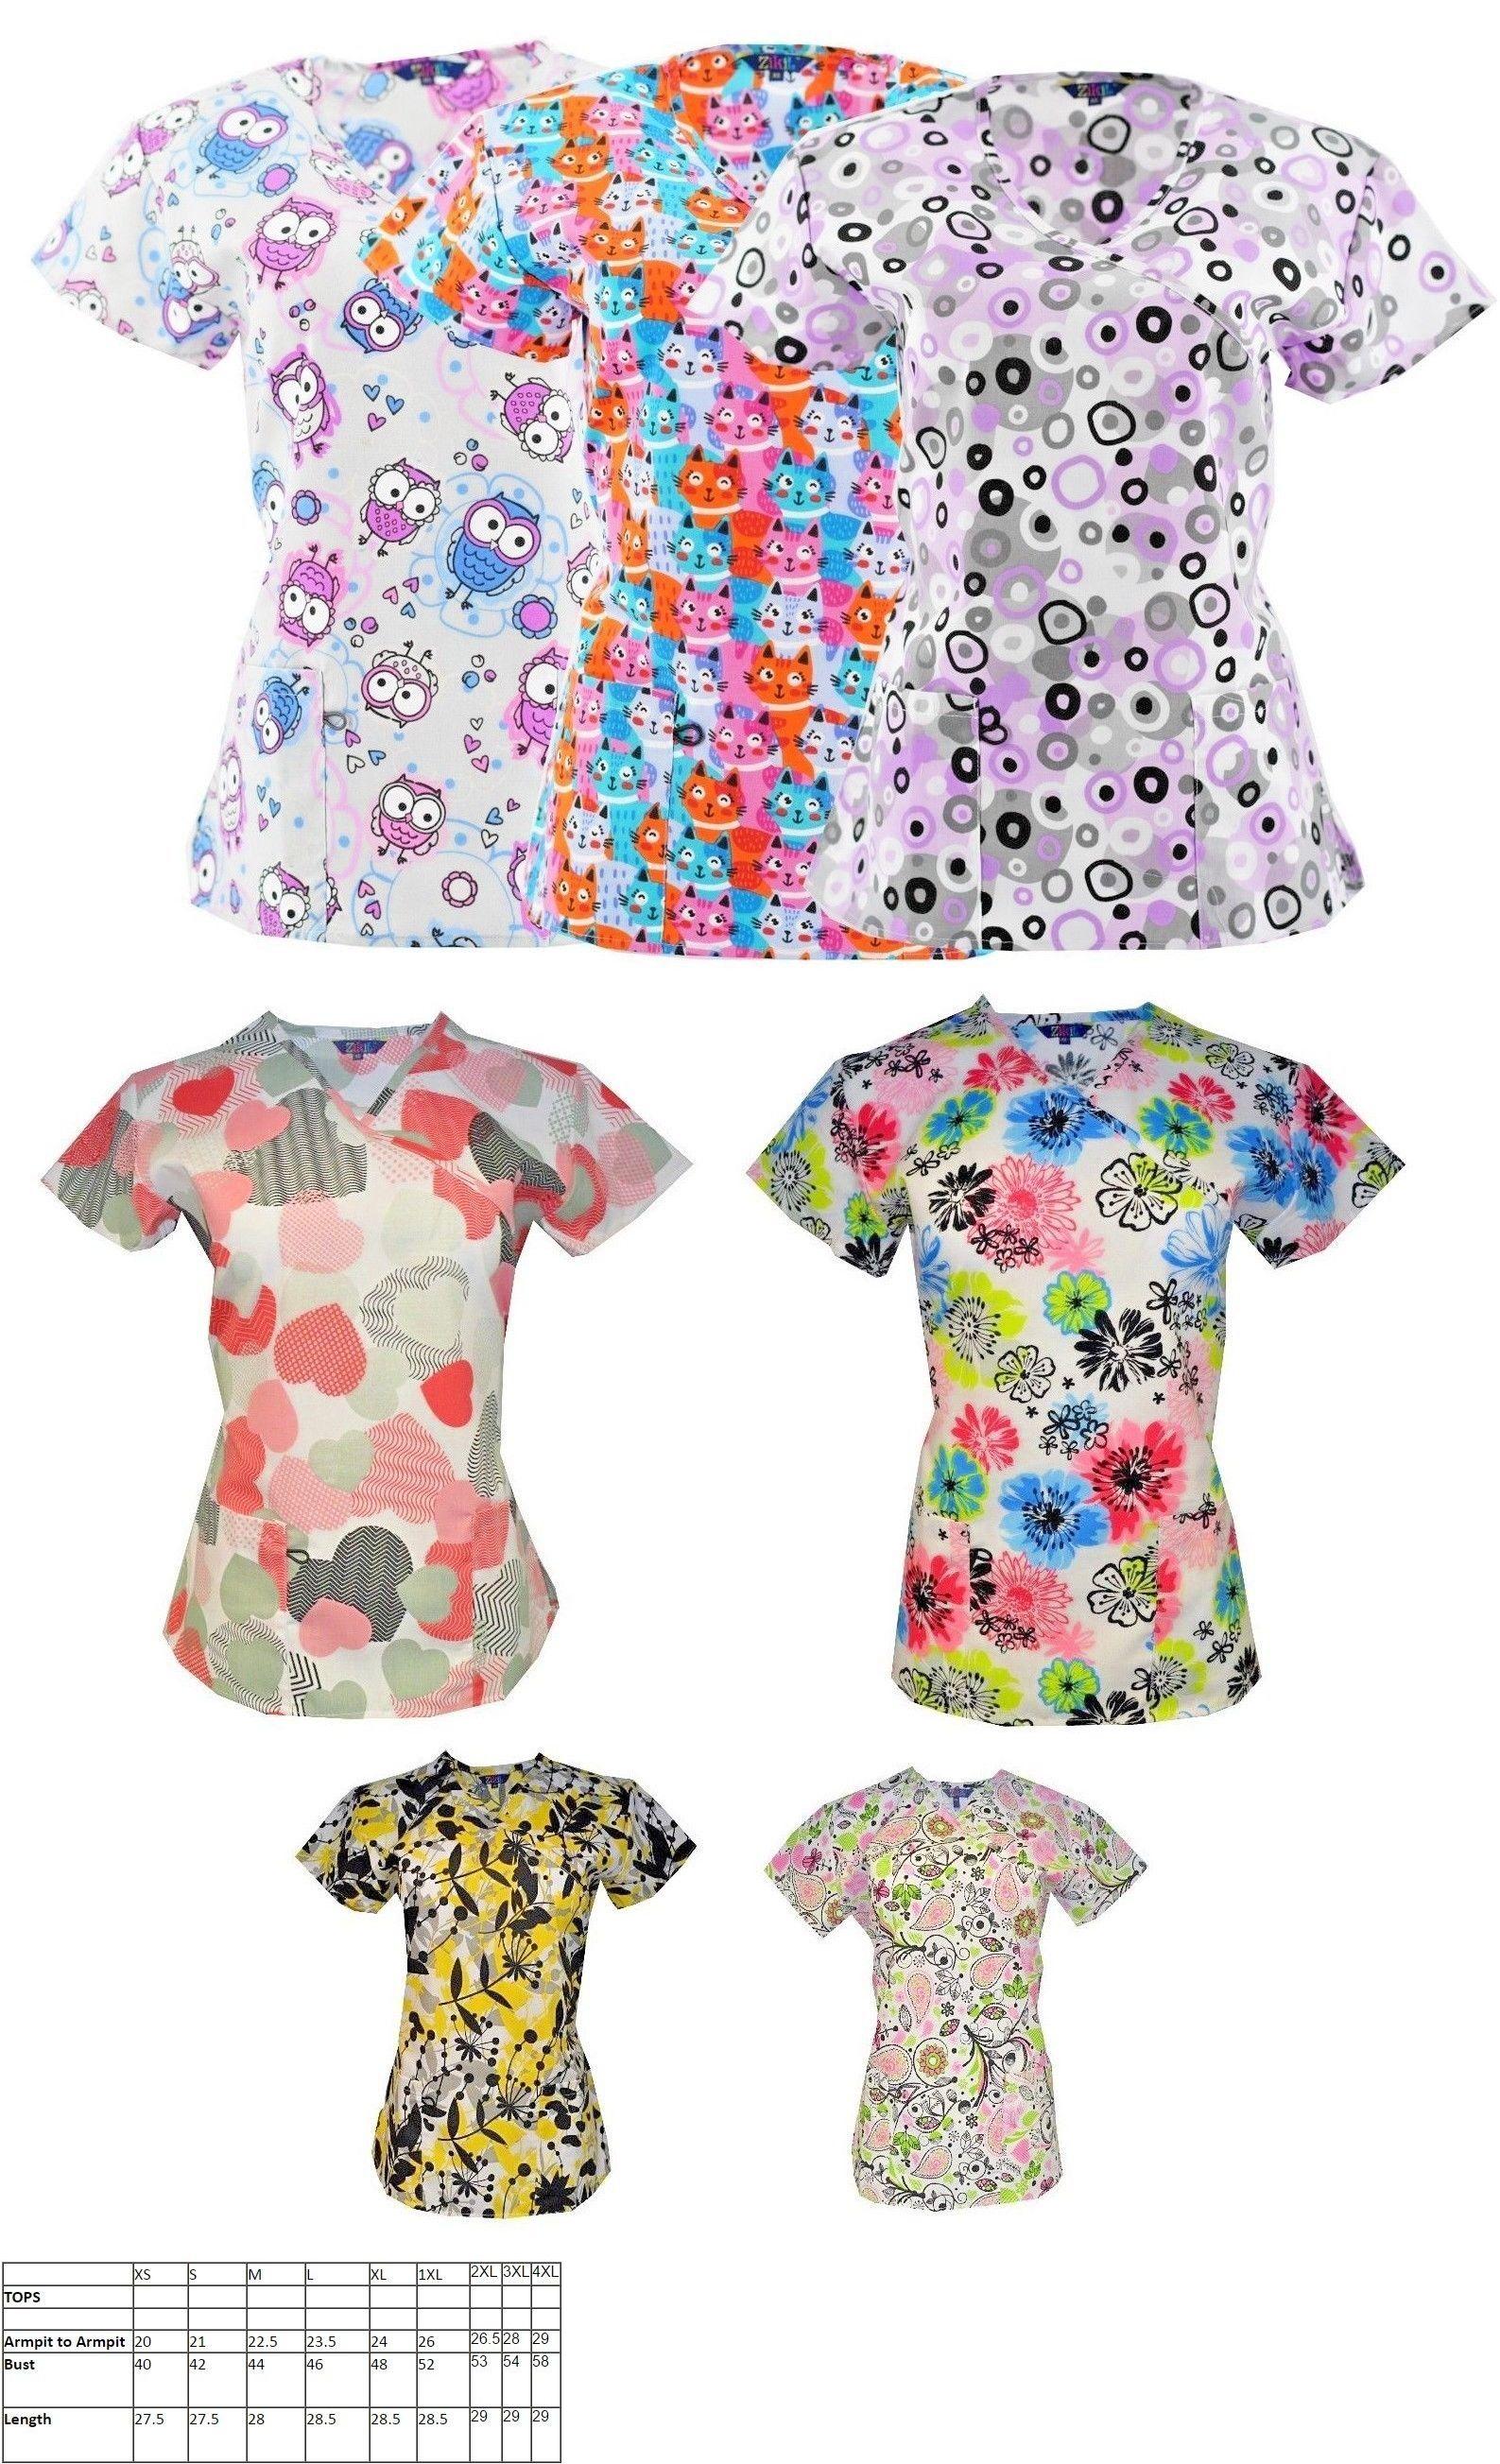 f2c40b50e24 Scrubs 105419: Women S Nursing Scrub Tops Printed Medical Uniforms Plus  Sizes Xs S M L Xl 2X 3X -> BUY IT NOW ONLY: $12.99 on #eBay #scrubs #women # nursing ...